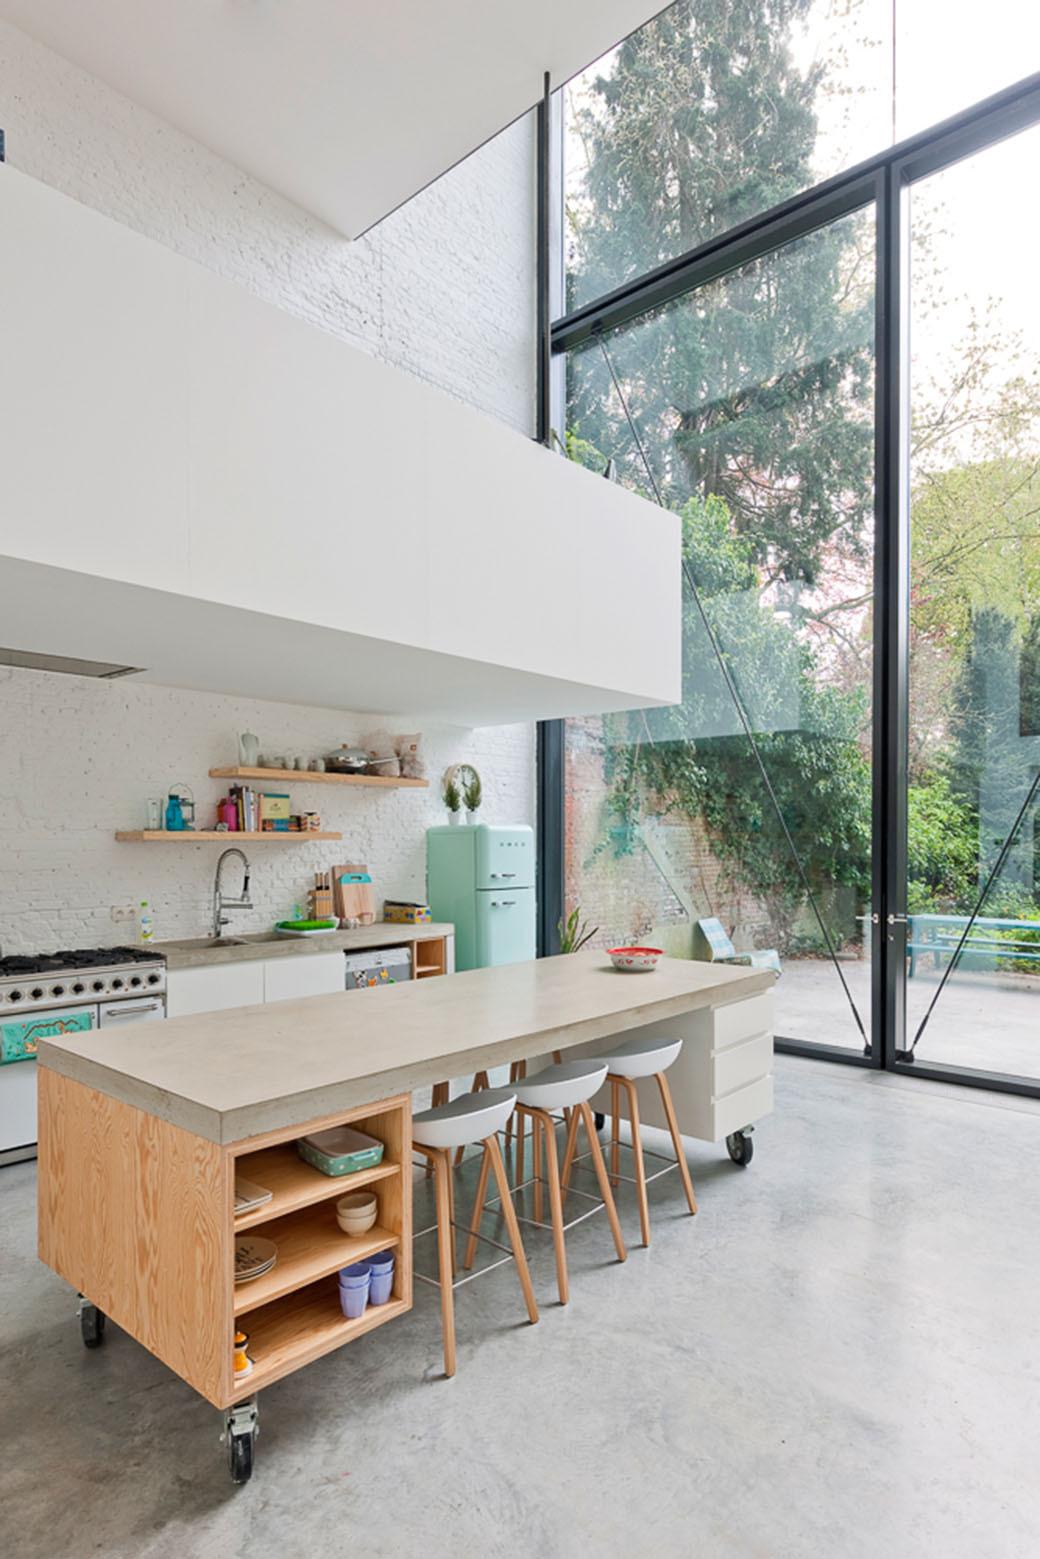 large-pivot-door-house-portable-kitchen-island